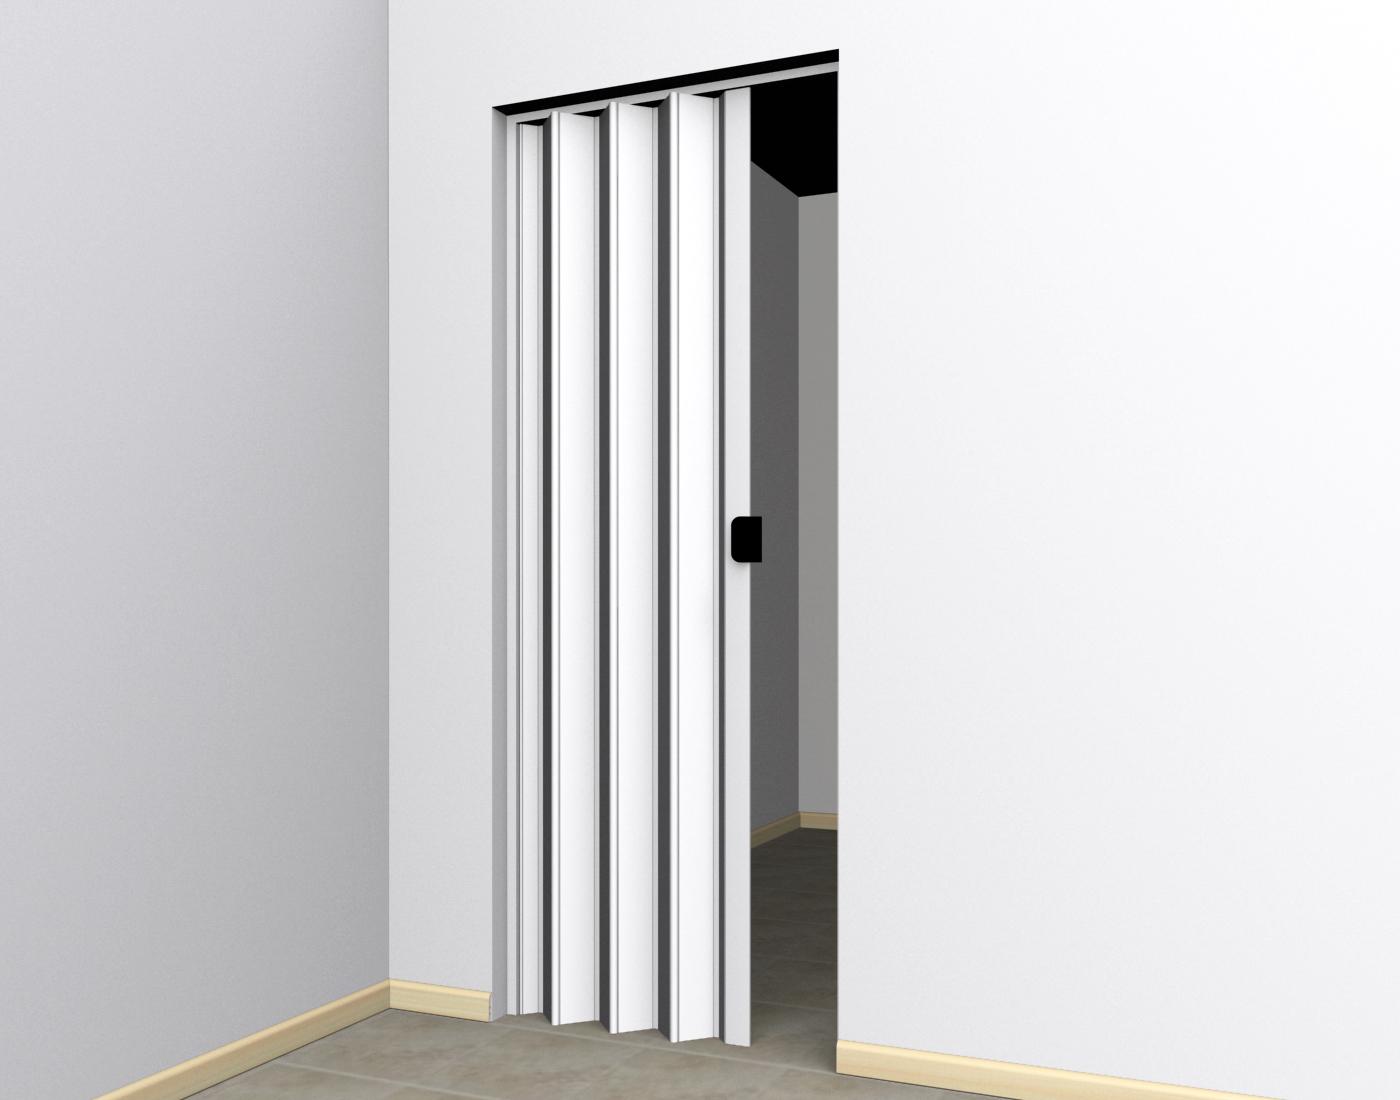 Imagens de #8A7341 Casa das Persianas e Cortinas: Portas Sanfonadas 1400x1100 px 3250 Box Acrilico Para Banheiro Feira De Santana